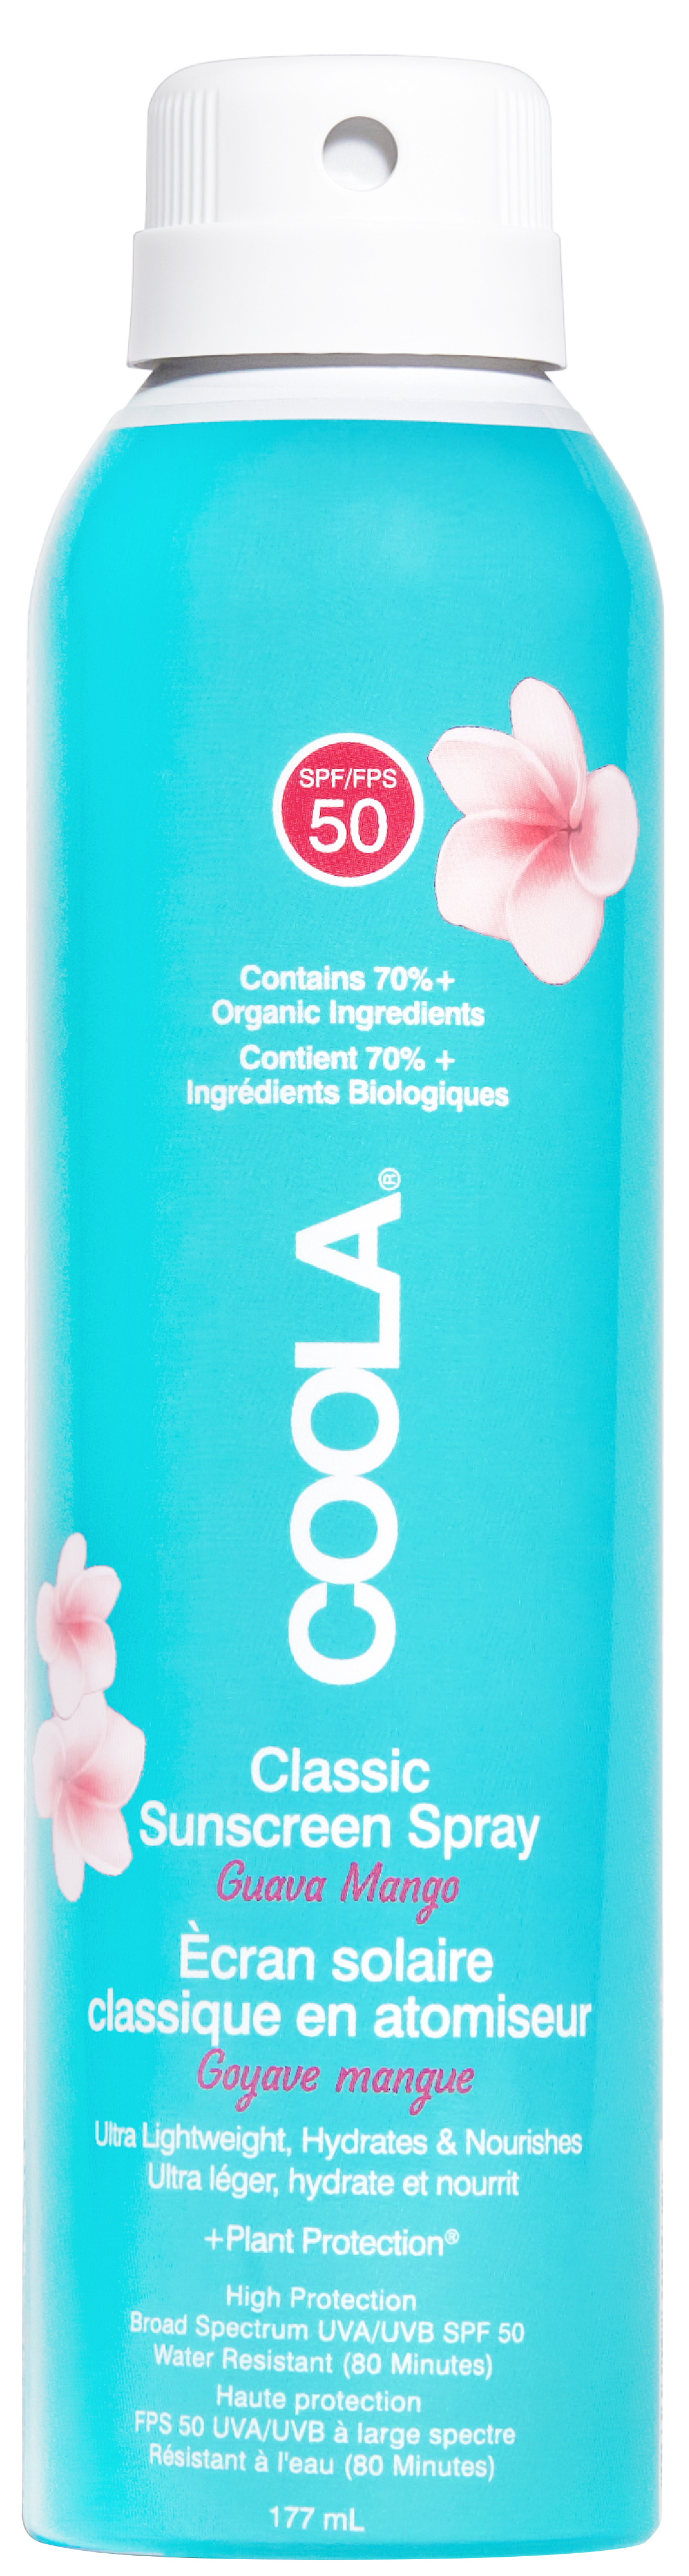 Coola Classic Body Spray Guava Mango SPF50